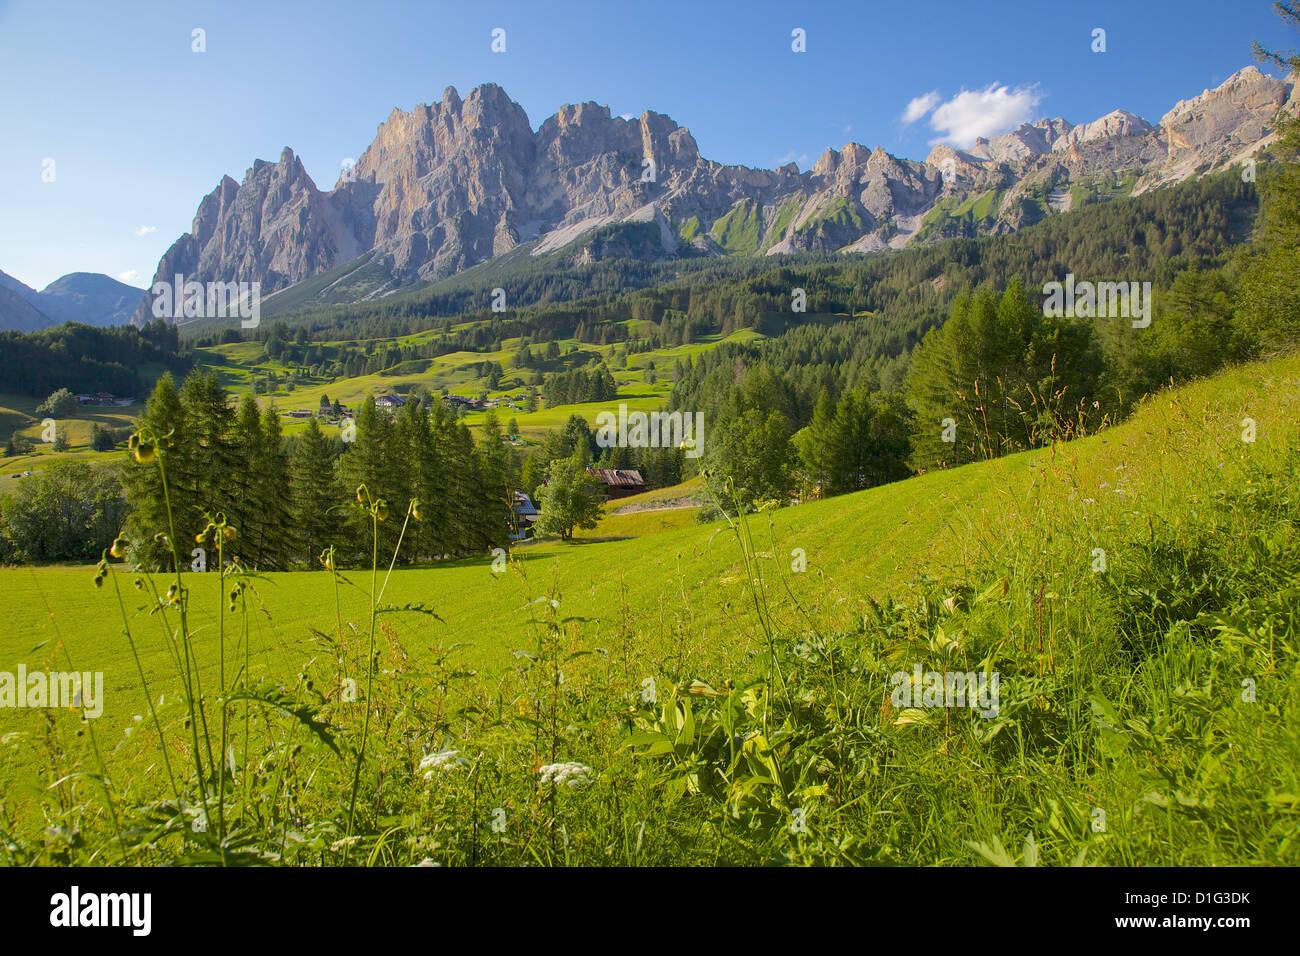 Passo Tre Croci, Belluno Province, Veneto, Italian Dolomites, Italy, Europe - Stock Image